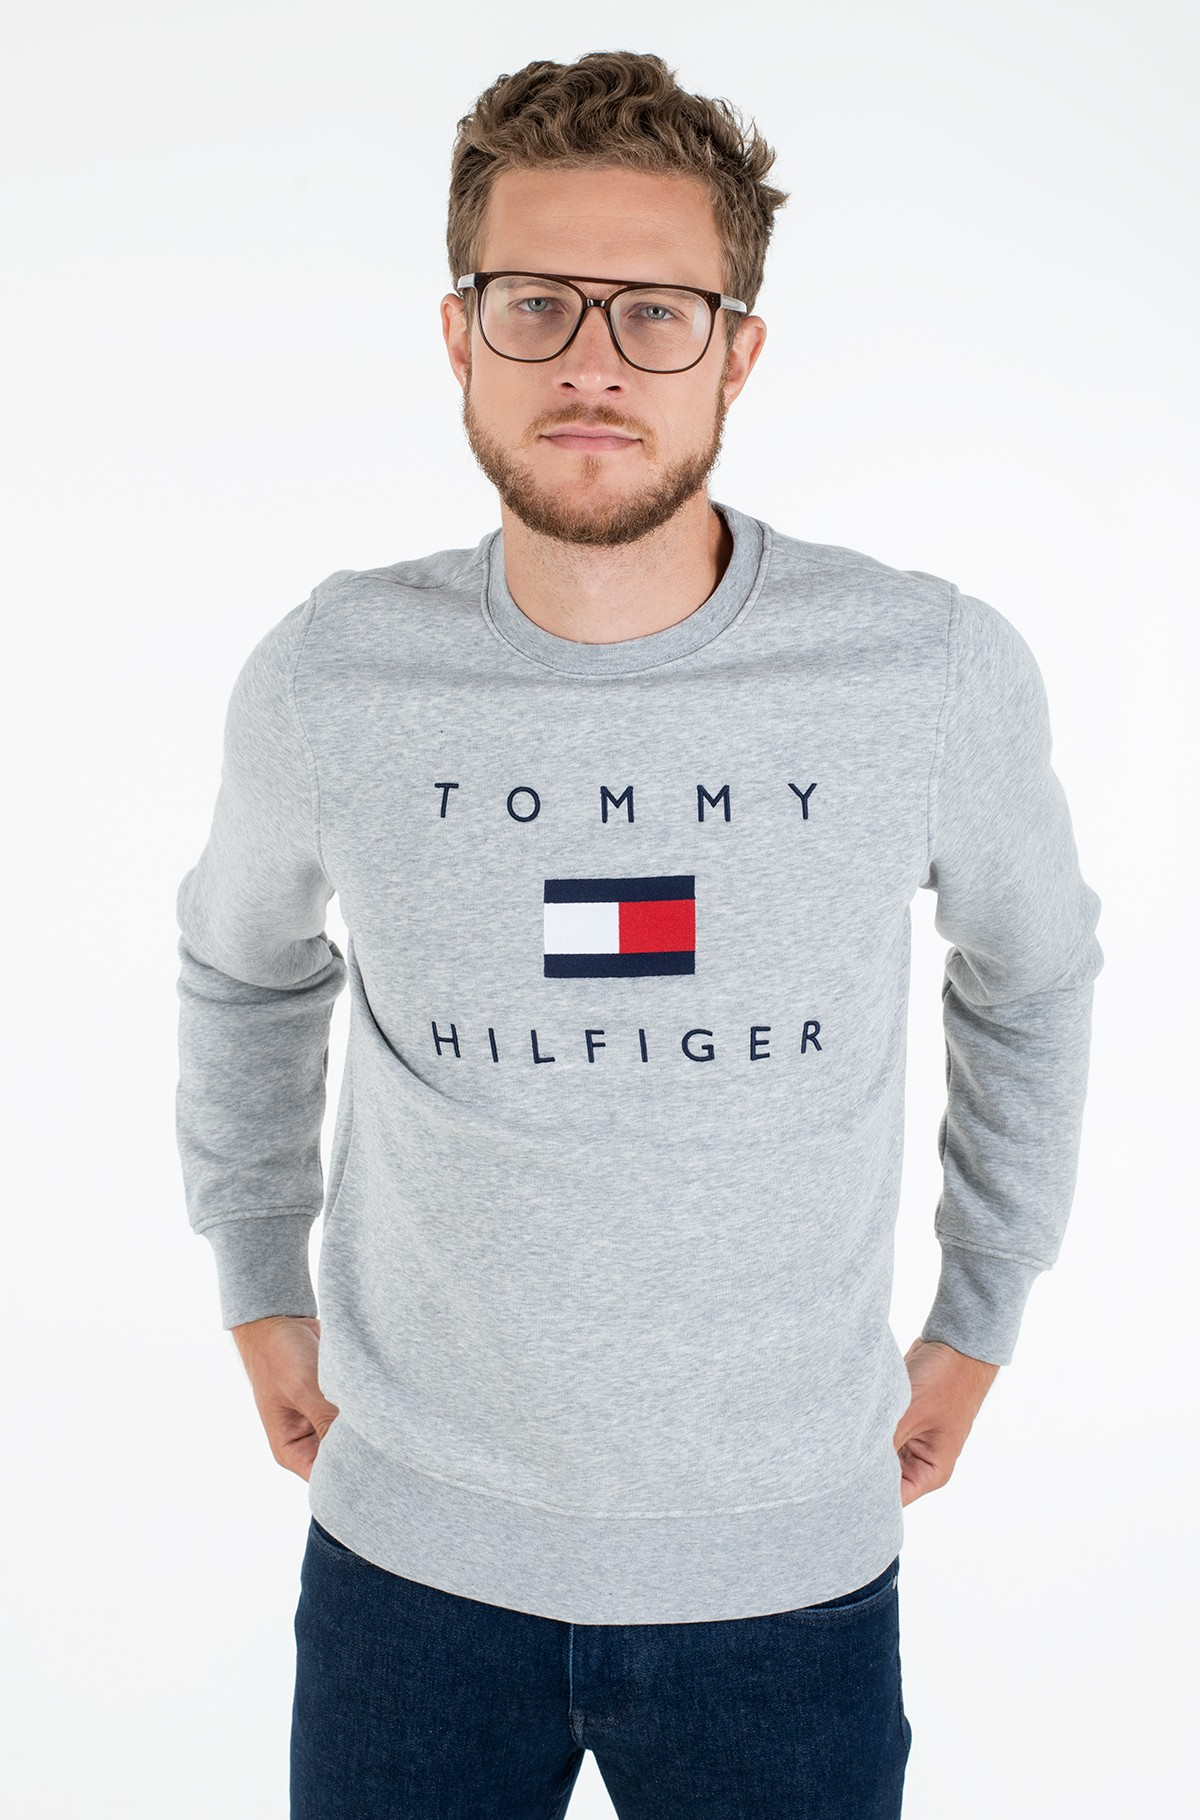 Dressipluus TOMMY FLAG HILFIGER SWEATSHIRT-full-1